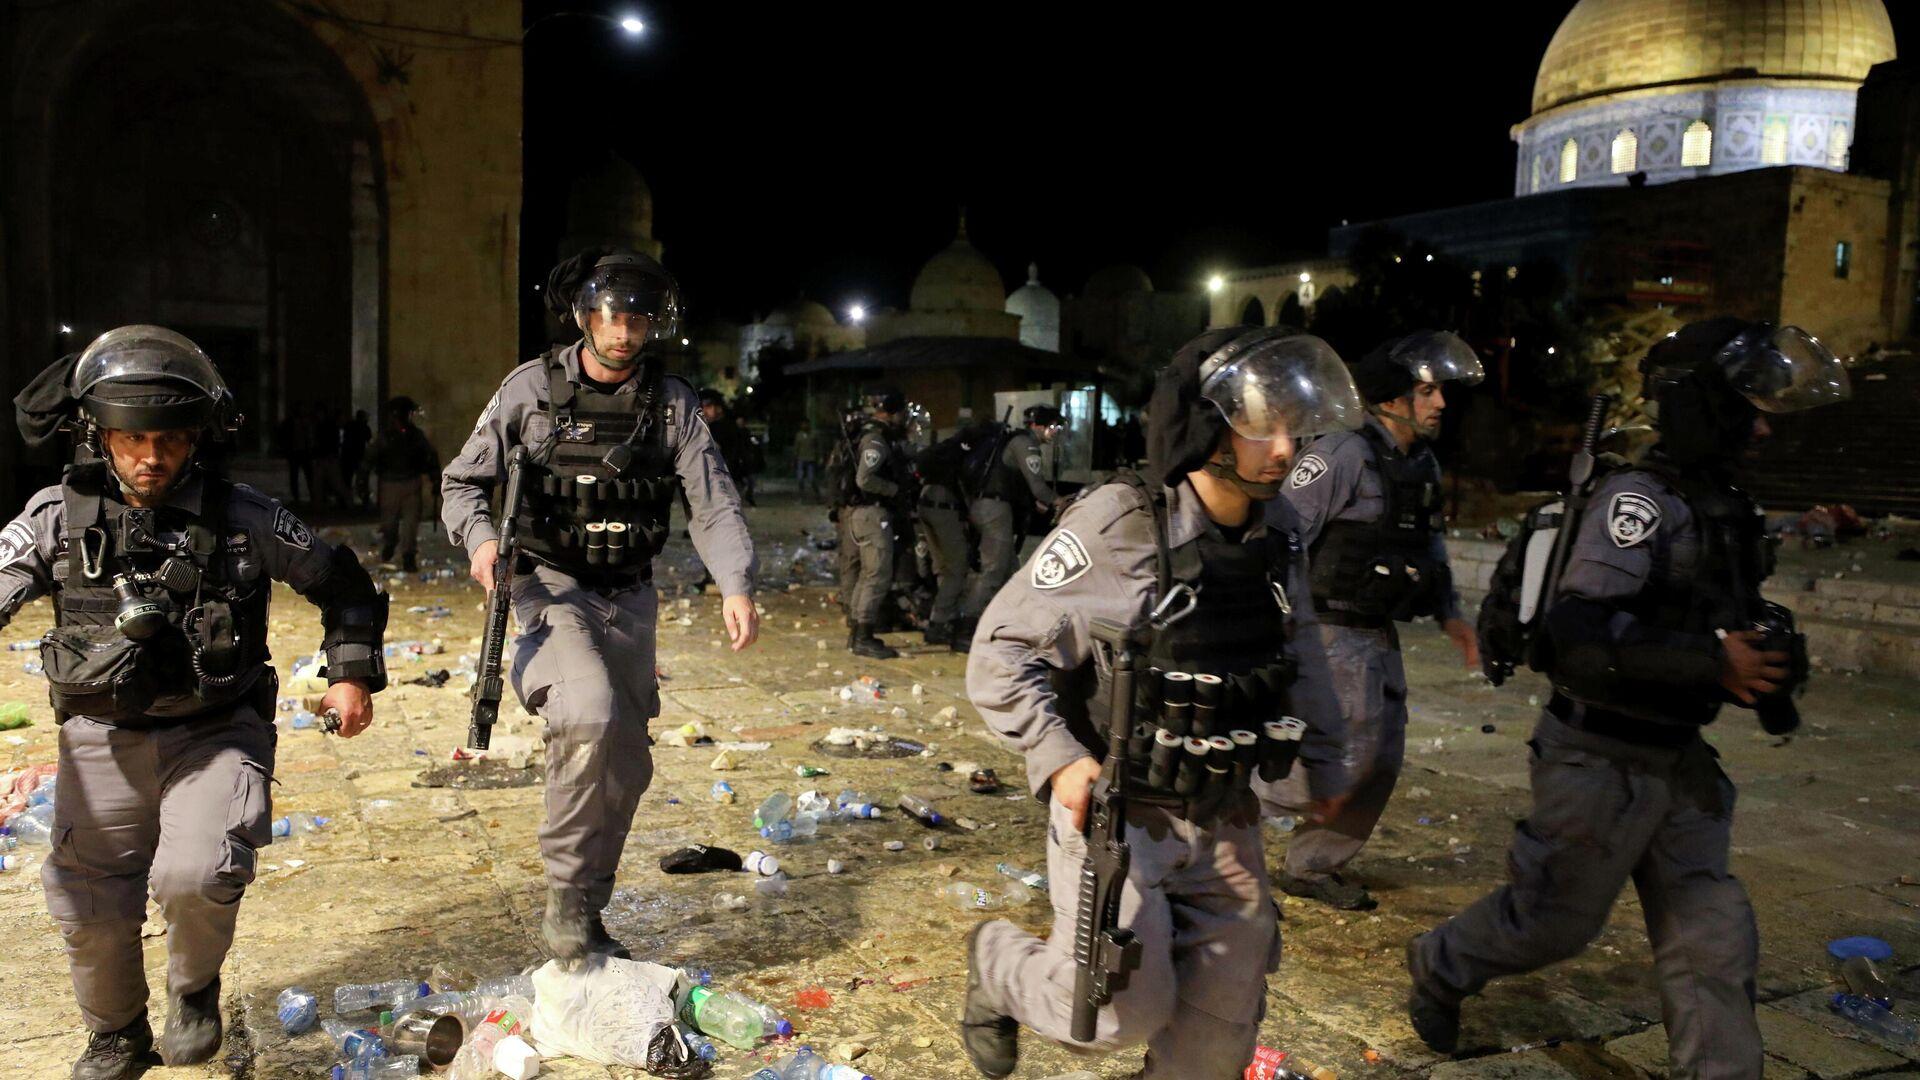 ХАМАС предъявил ультиматум Израилю